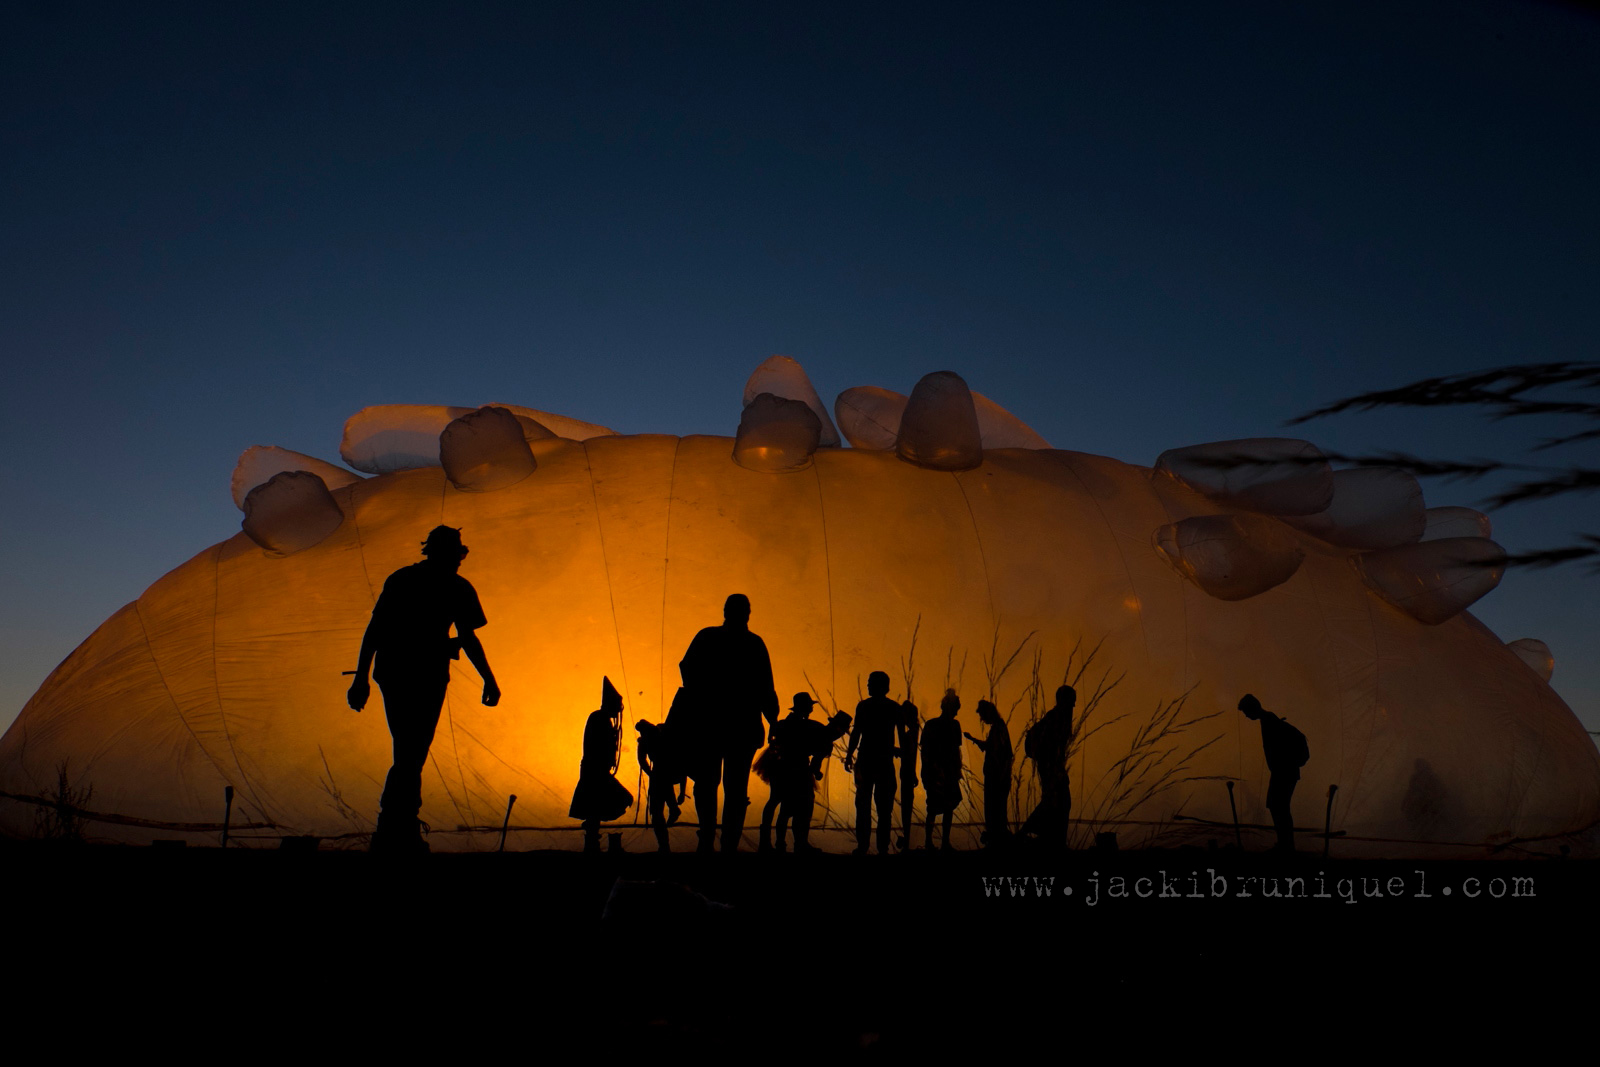 Afrika-Burn-2016-Creative-South-African-Photographer-Jacki-Bruniquel-034.jpg